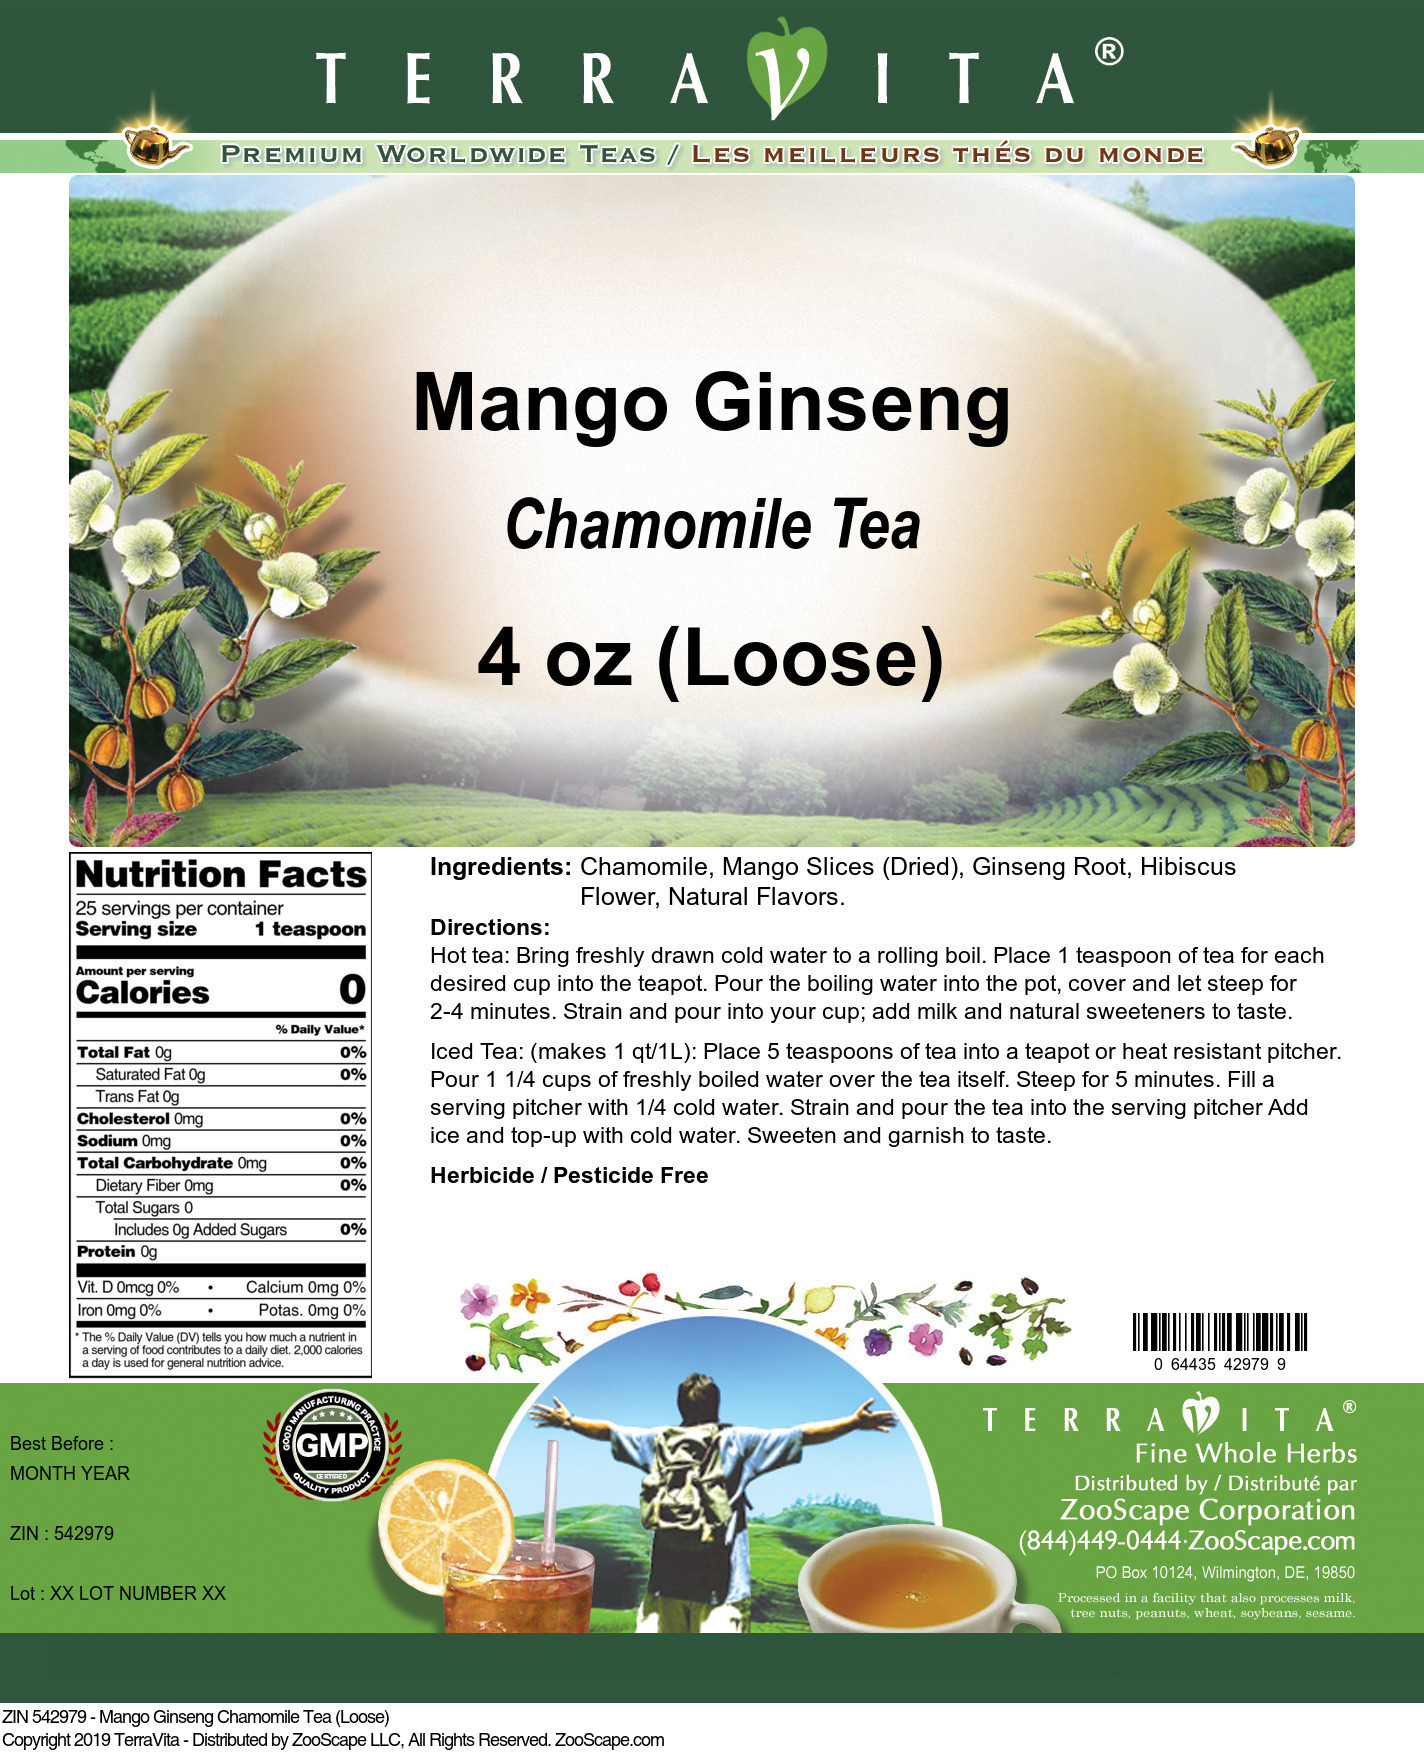 Mango Ginseng Chamomile Tea